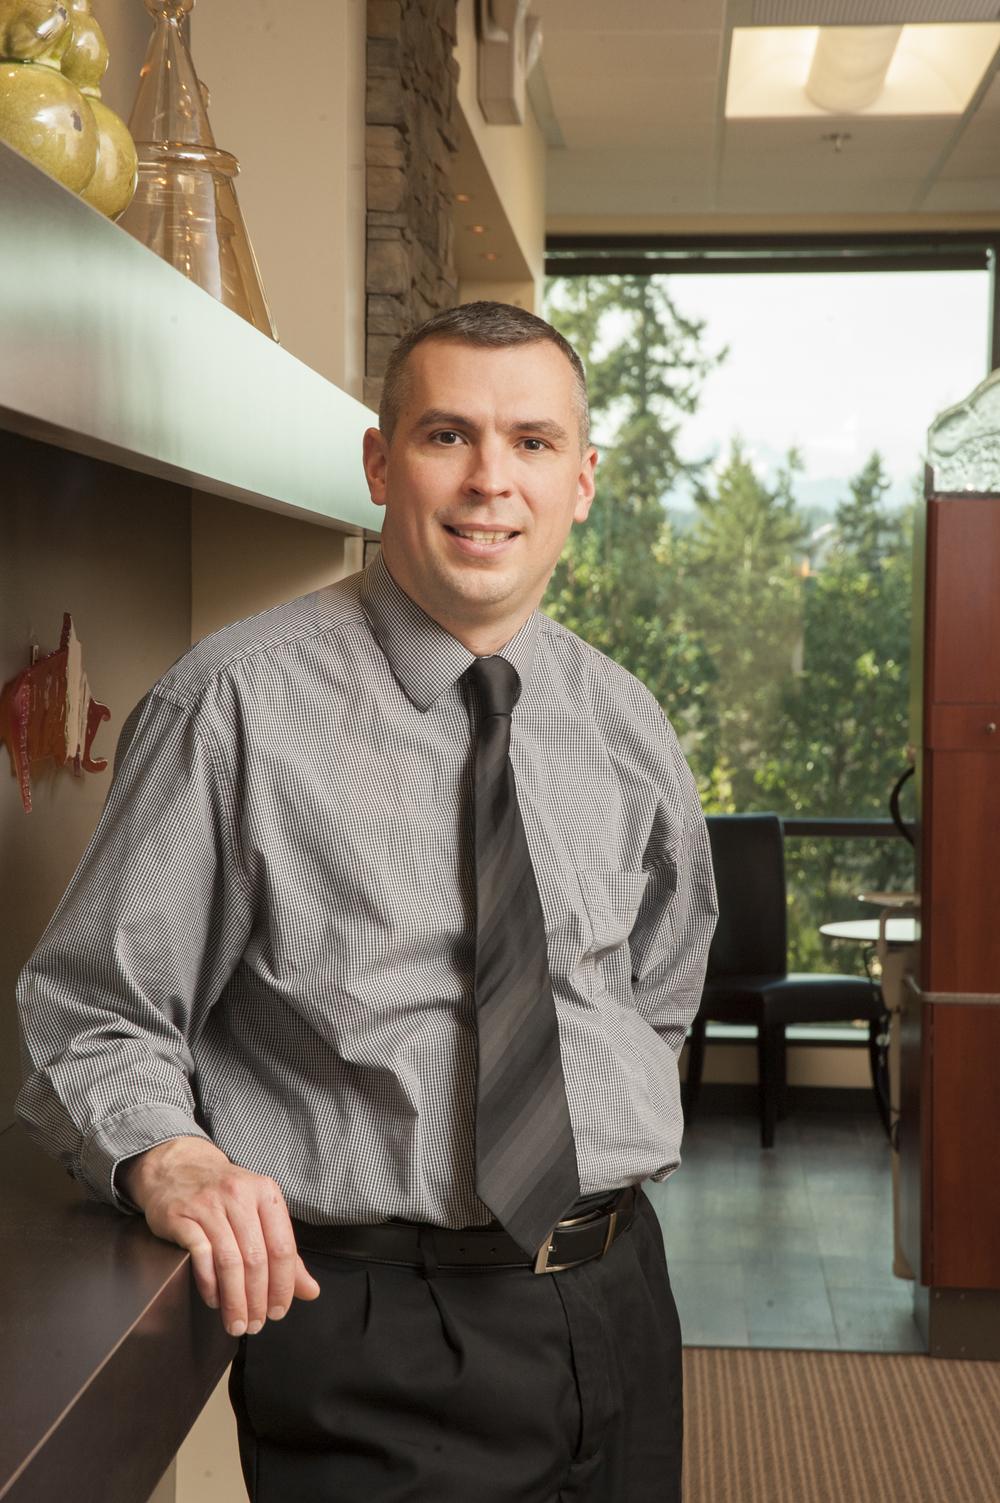 Dr. Scott Stewart - experienced dentist, caring leader, wise visionary (Dr. Scott Stewart General Family Dentist, Silverdale Dentist)